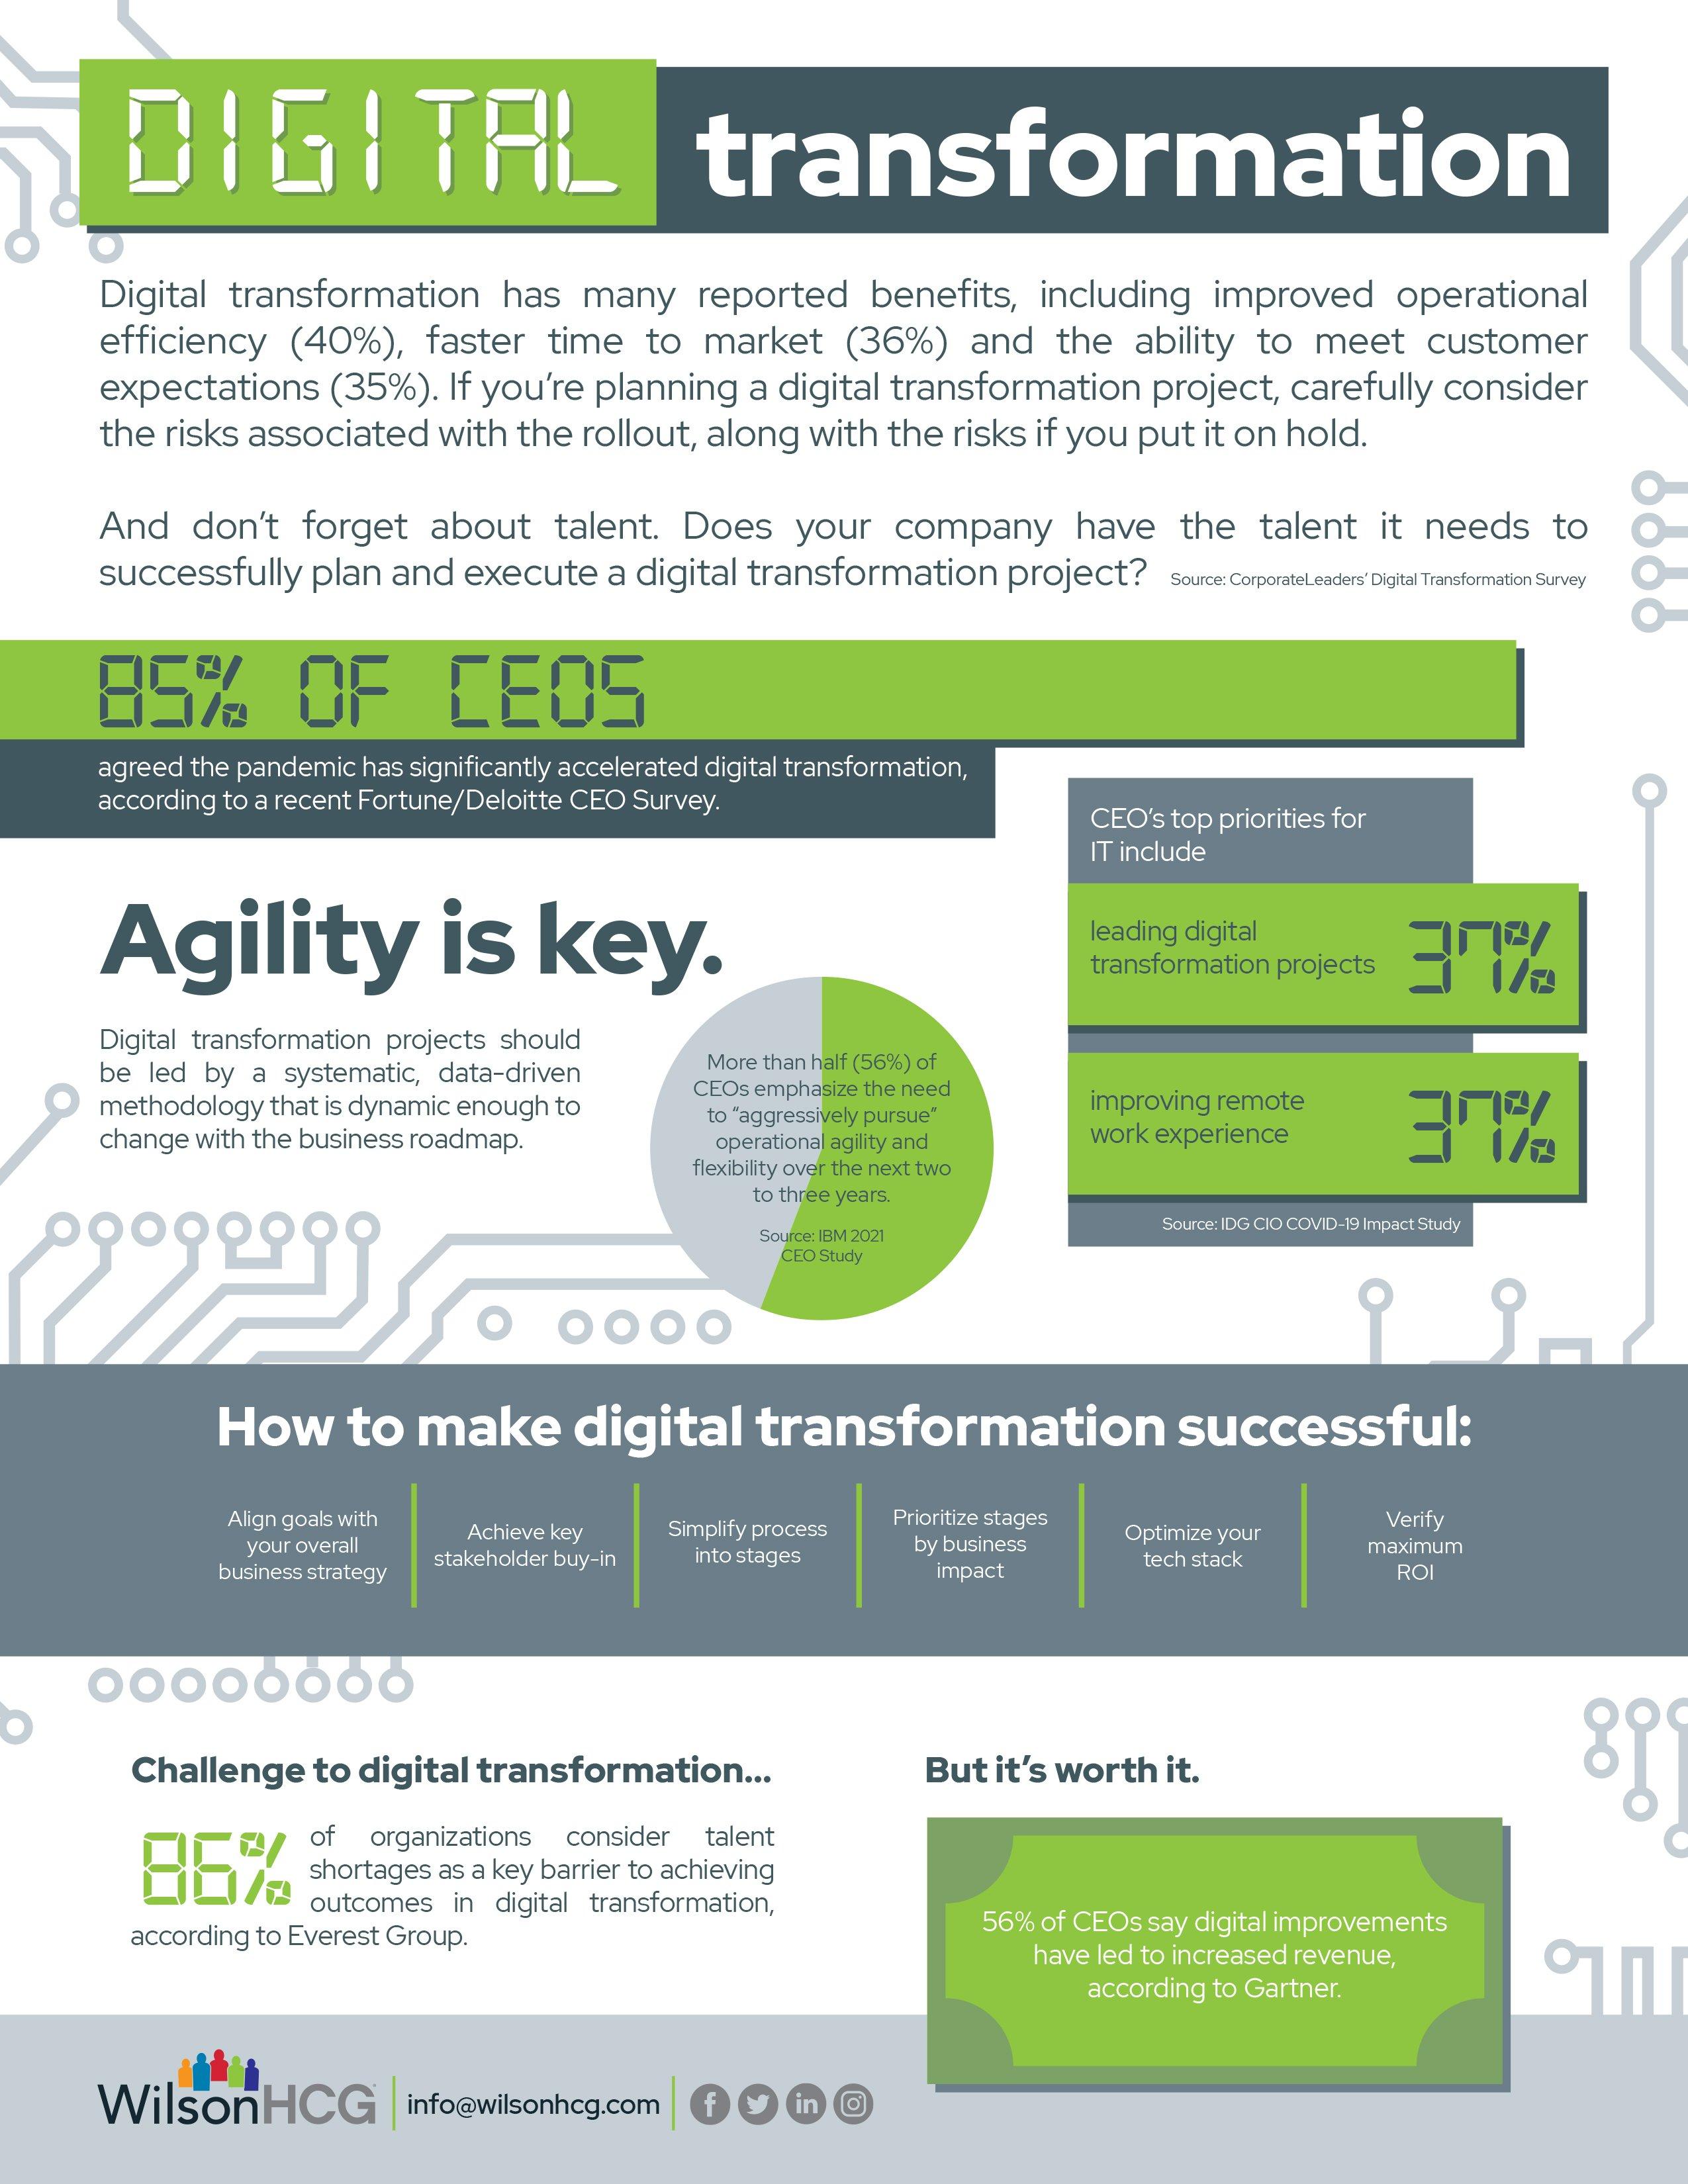 DigitalTransformation-infographic